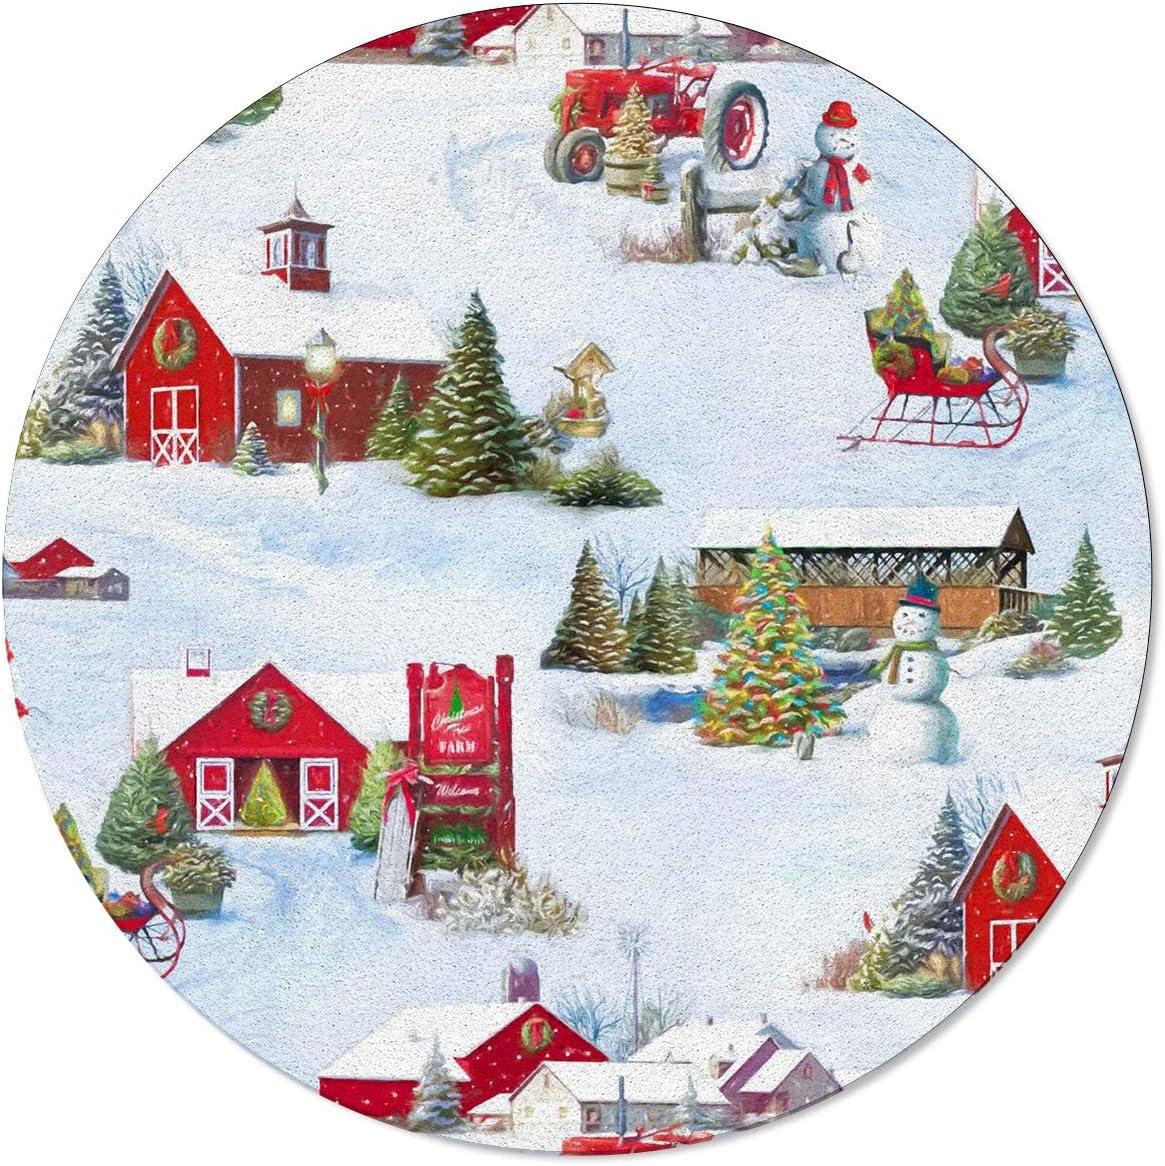 ARTSHOWING Christmas Scenery Round Trust Area Non-Slip Austin Mall F Rug Soft 5ft